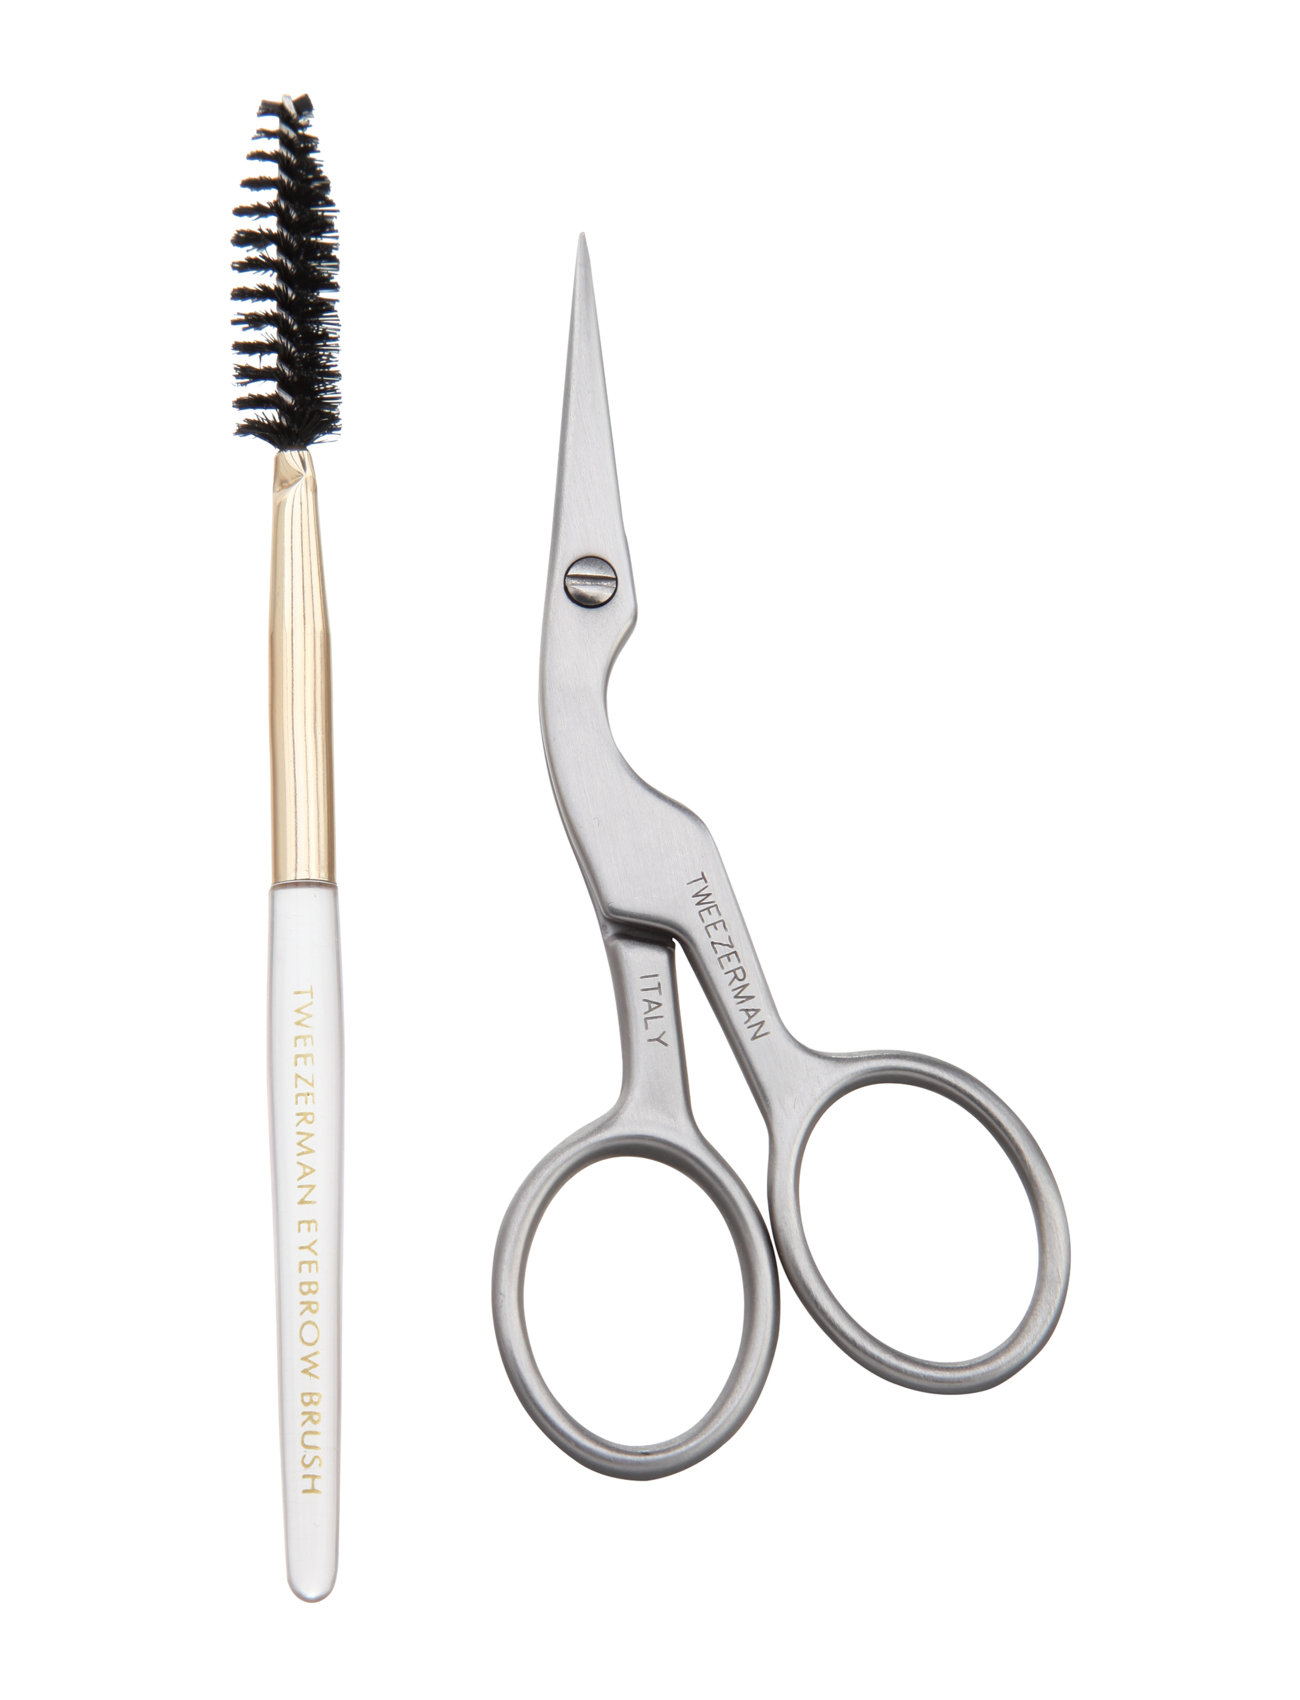 Brow Shaping Scissors & Brush - Tweezerman